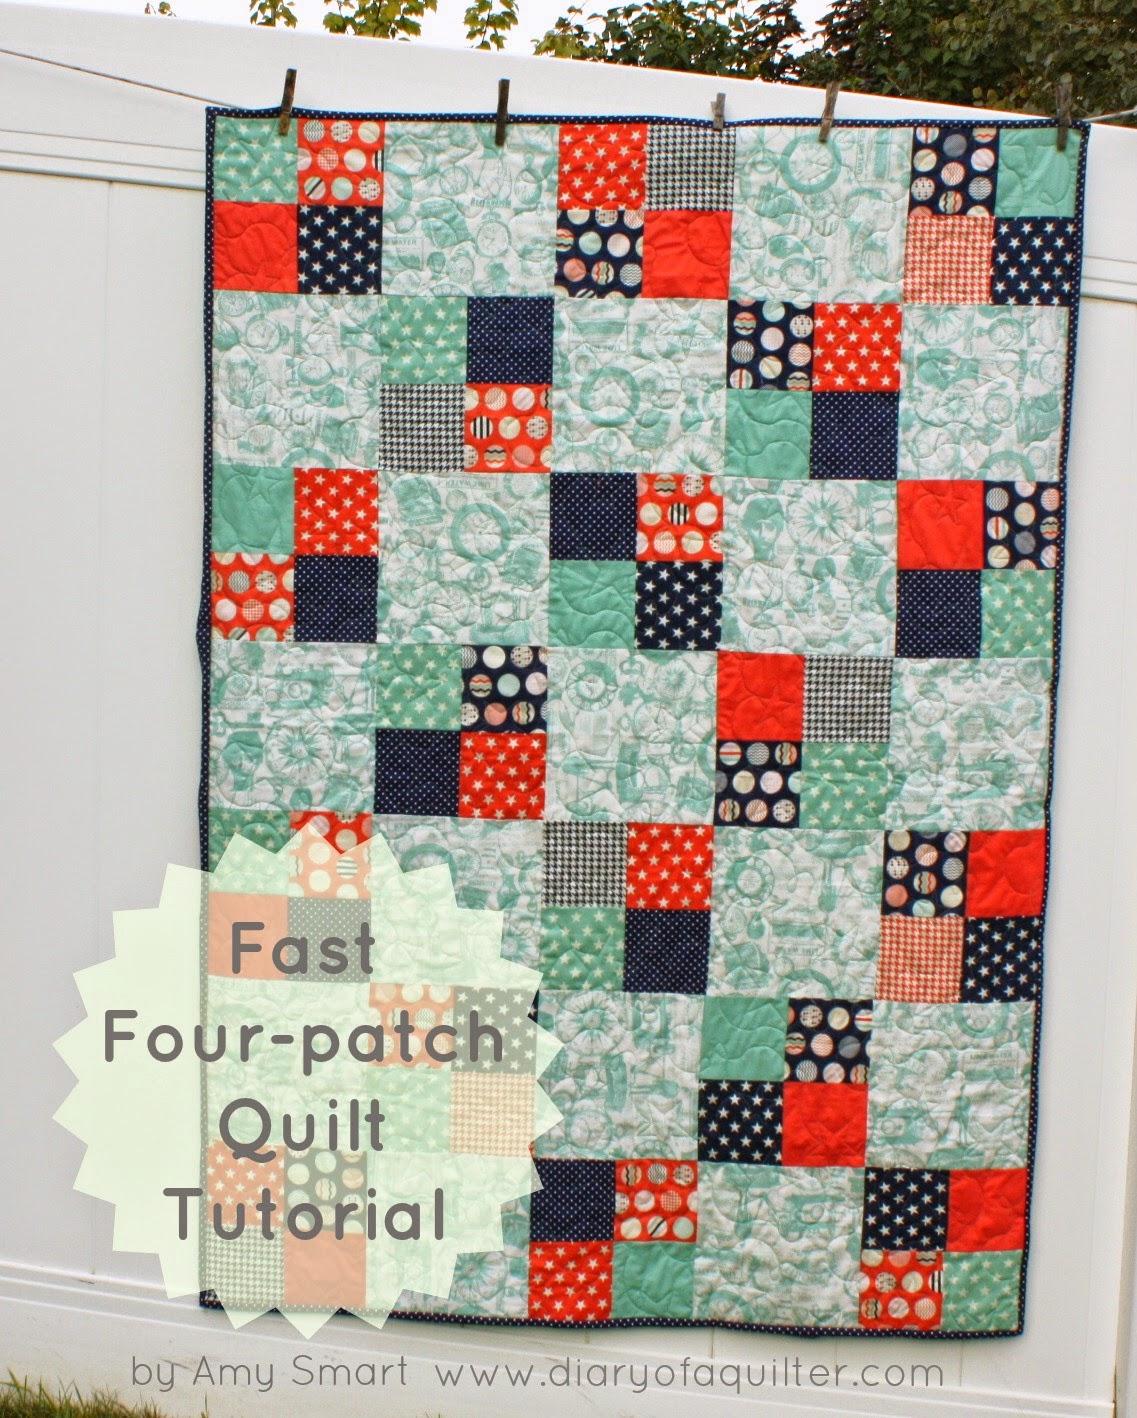 Baby Quilts Patterns. Half Snowball Quilt Block Tutorial. Easy ... : free quilting tutorials online - Adamdwight.com